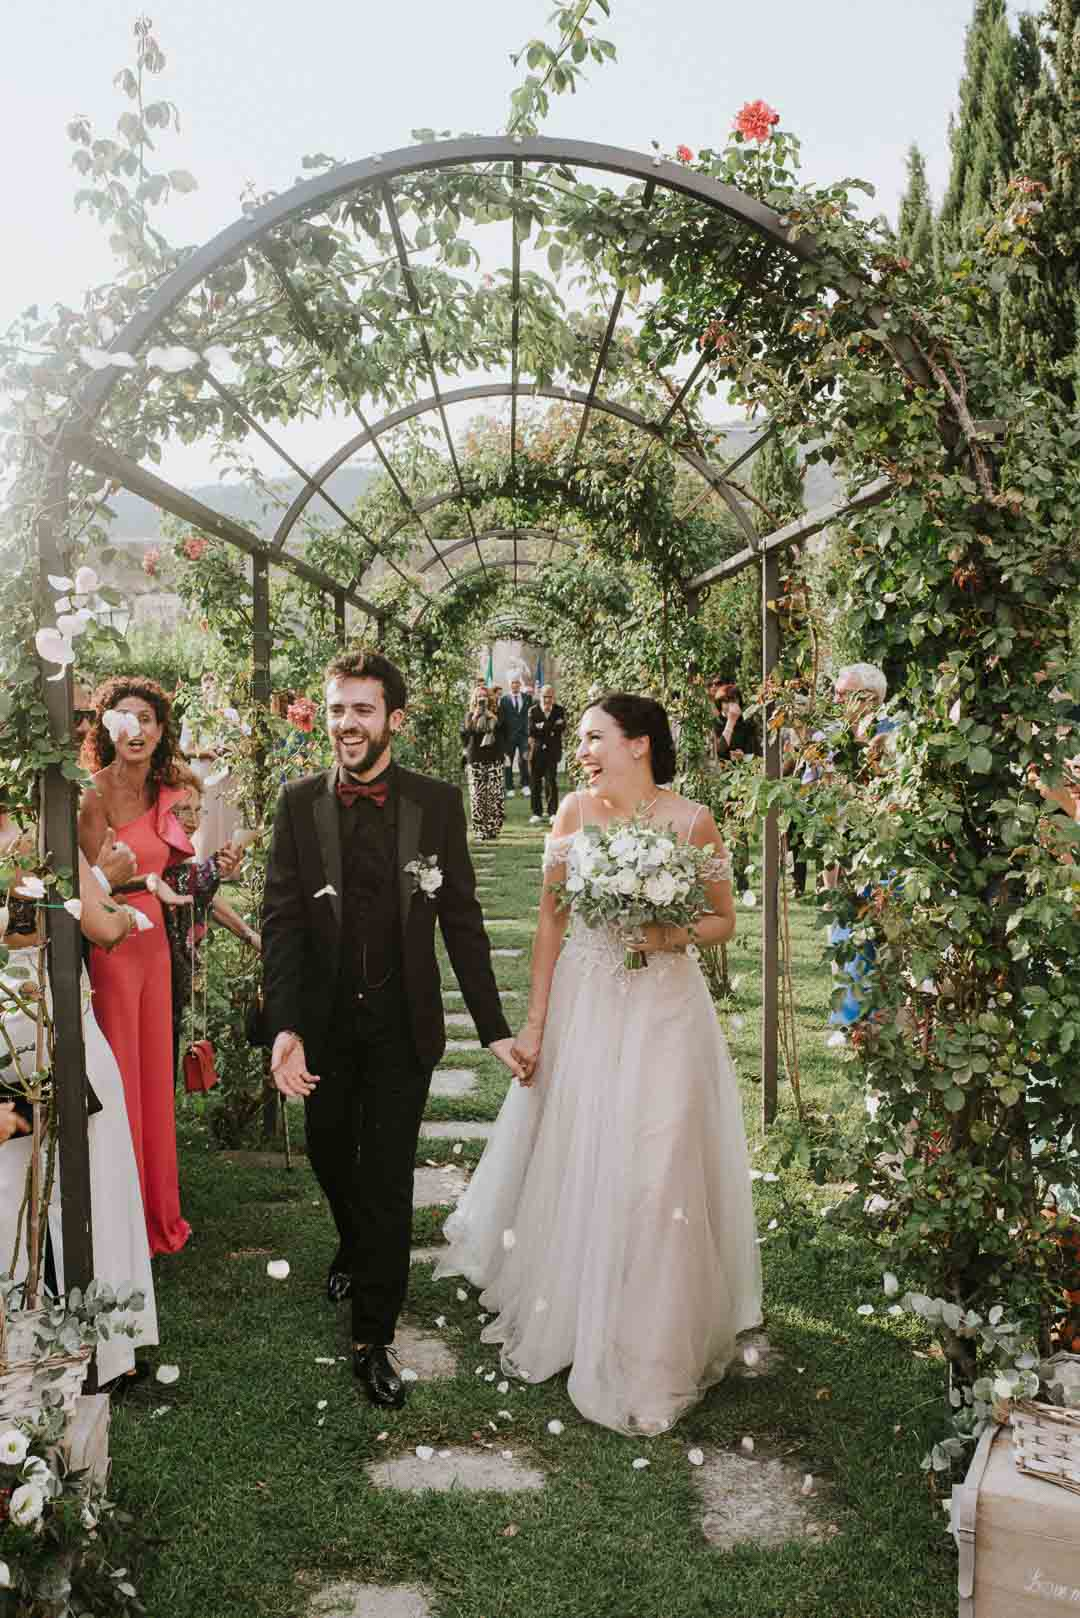 wedding-photographer-destination-fineart-bespoke-reportage-tuscany-villascorzi-vivianeizzo-spazio46-86